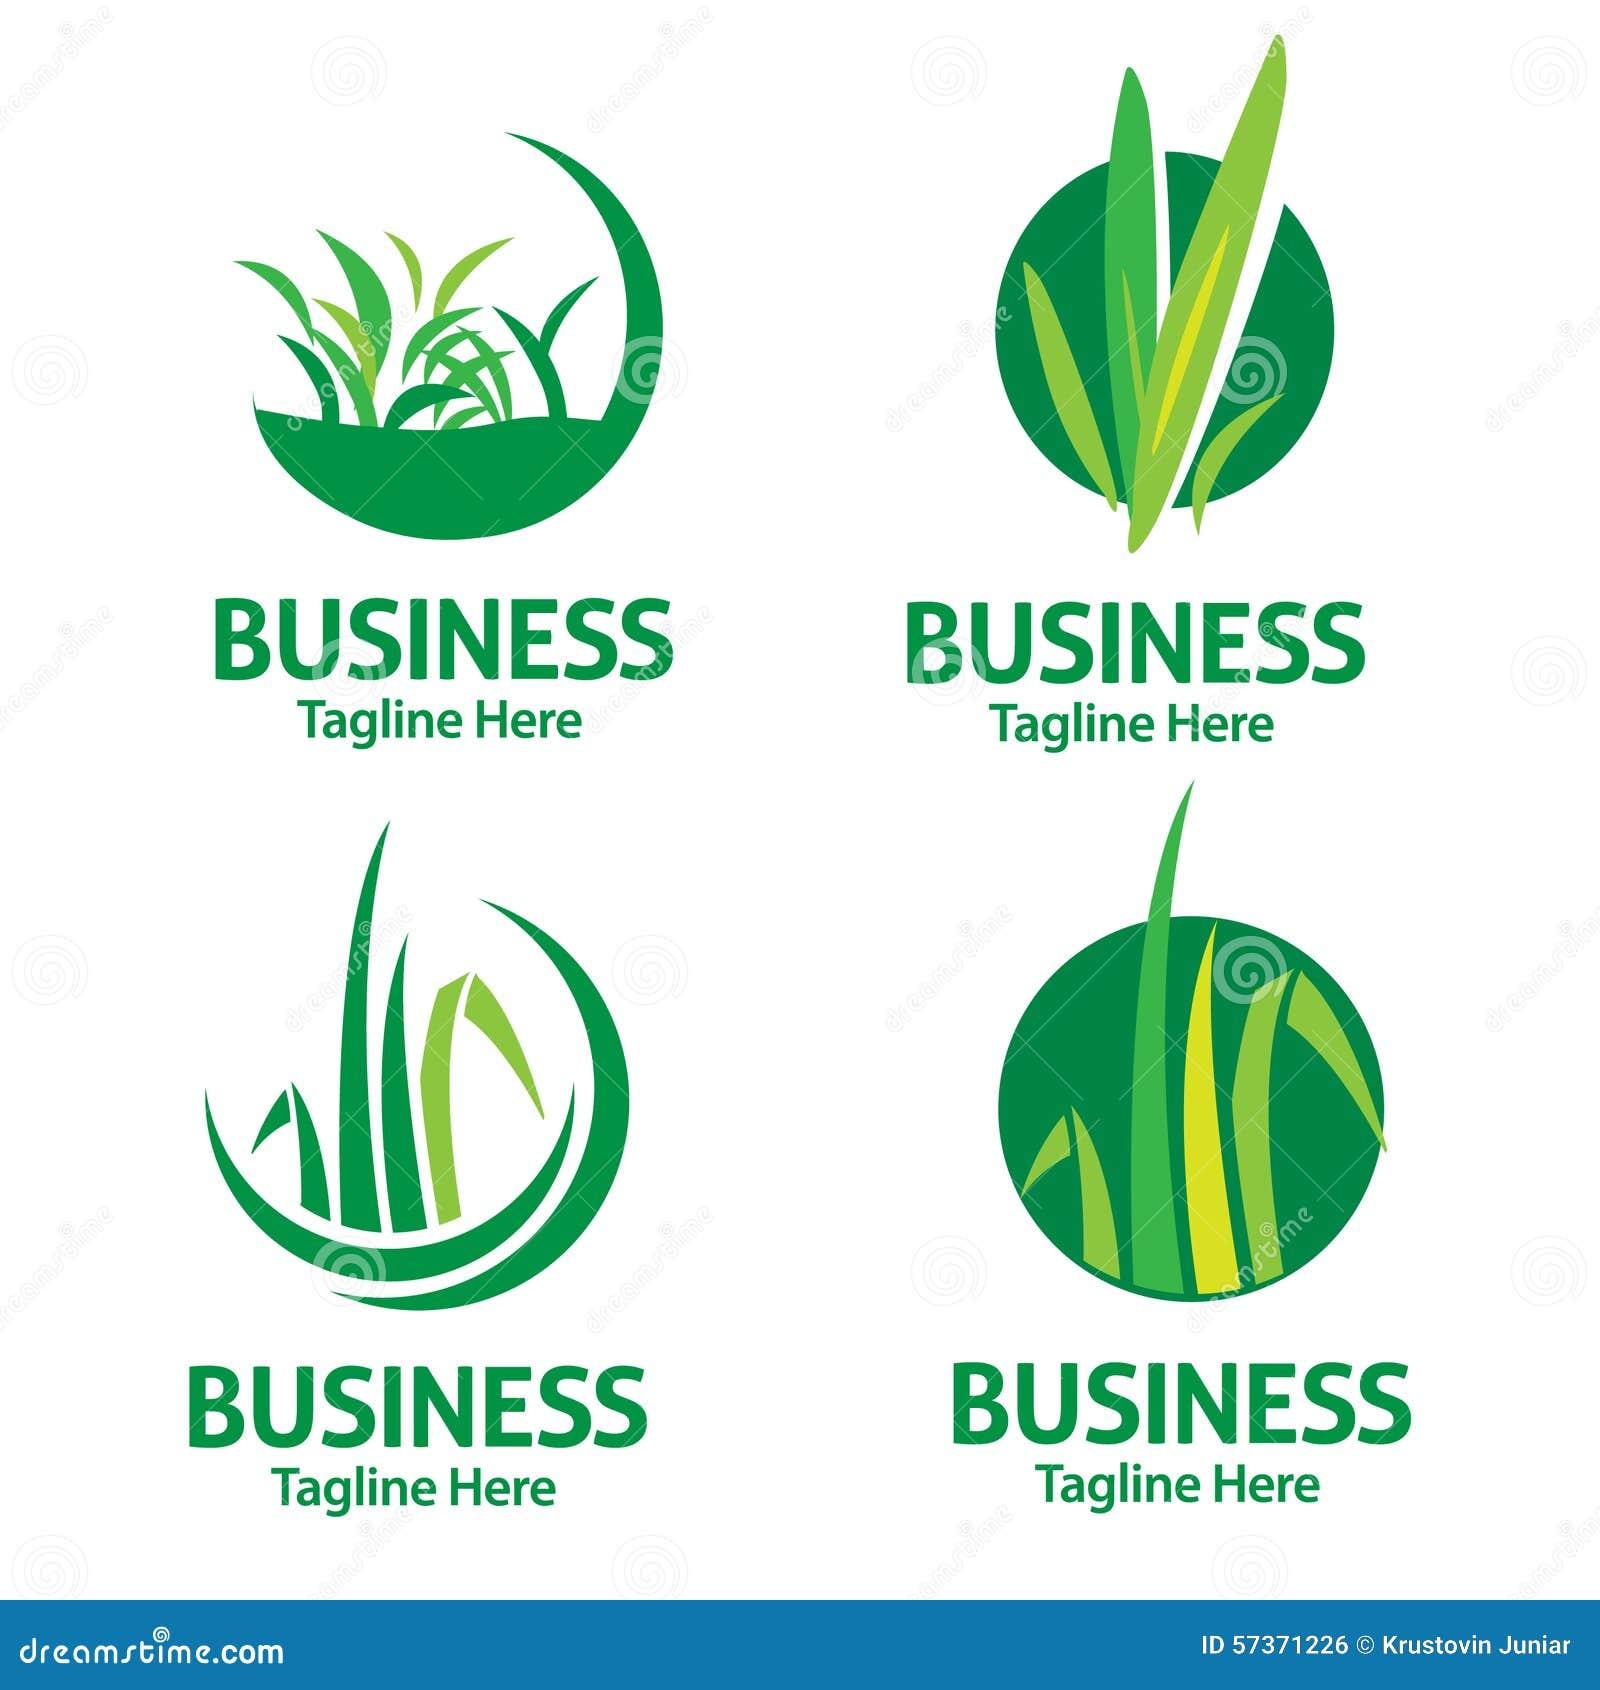 Lawn Care Logo Stock Vector - Image: 57371226